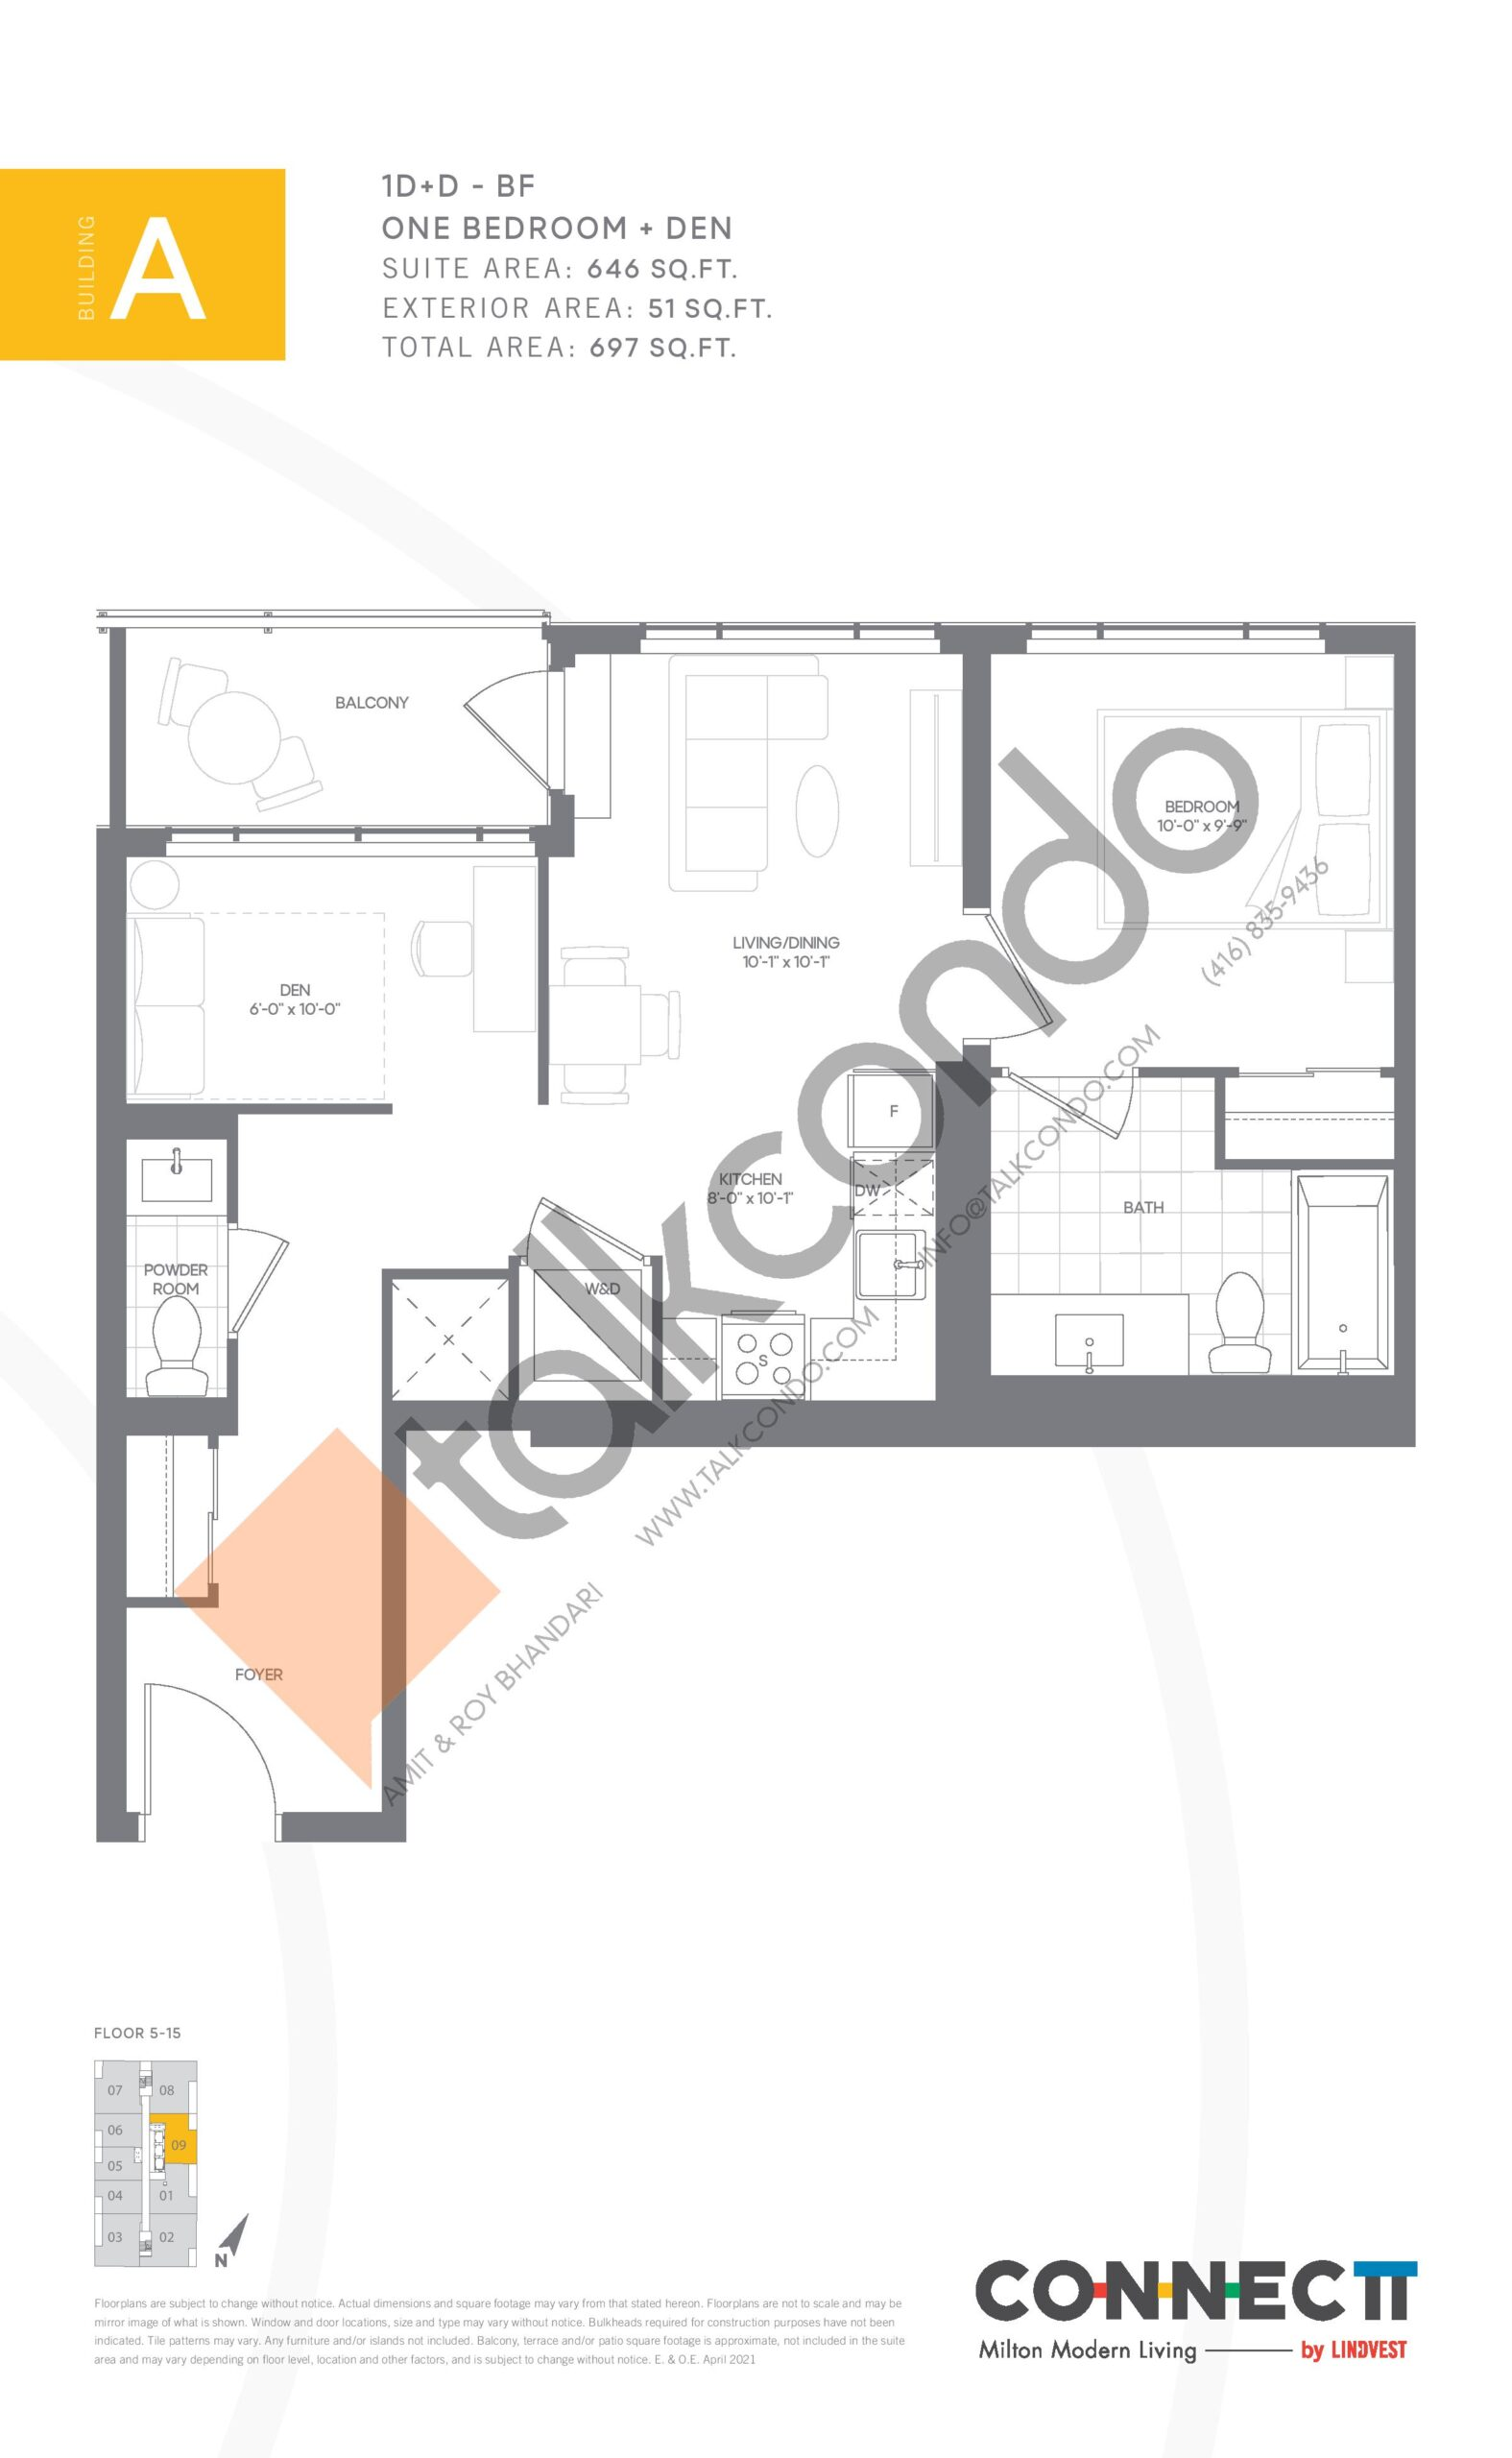 1D+D - BF Floor Plan at Connectt Urban Community Condos - 646 sq.ft